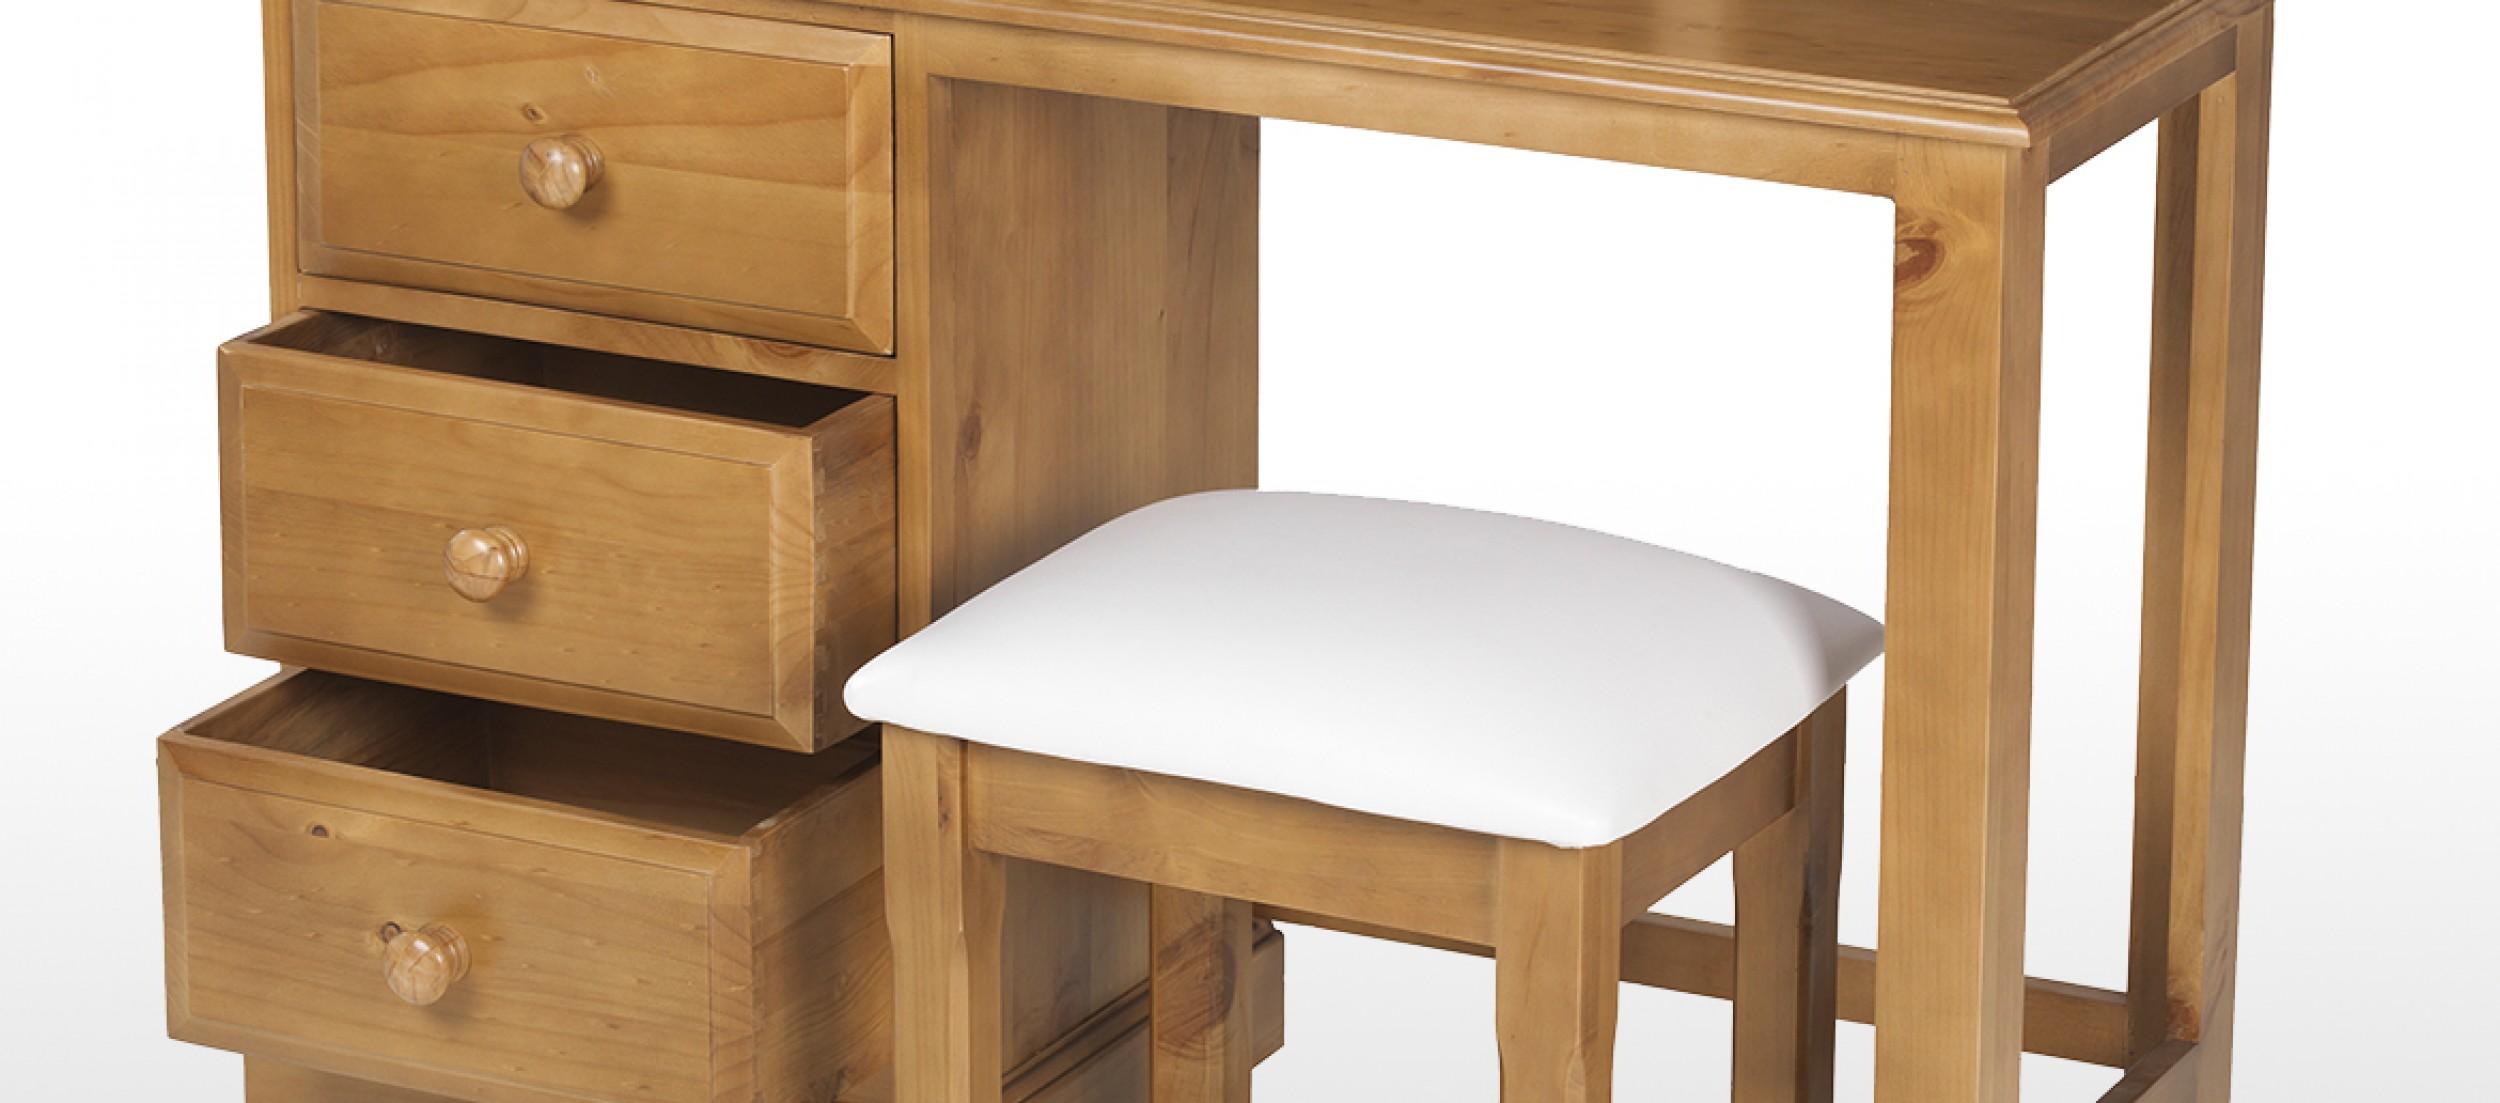 Essentials Pine Dressing Table Set | Quercus Living